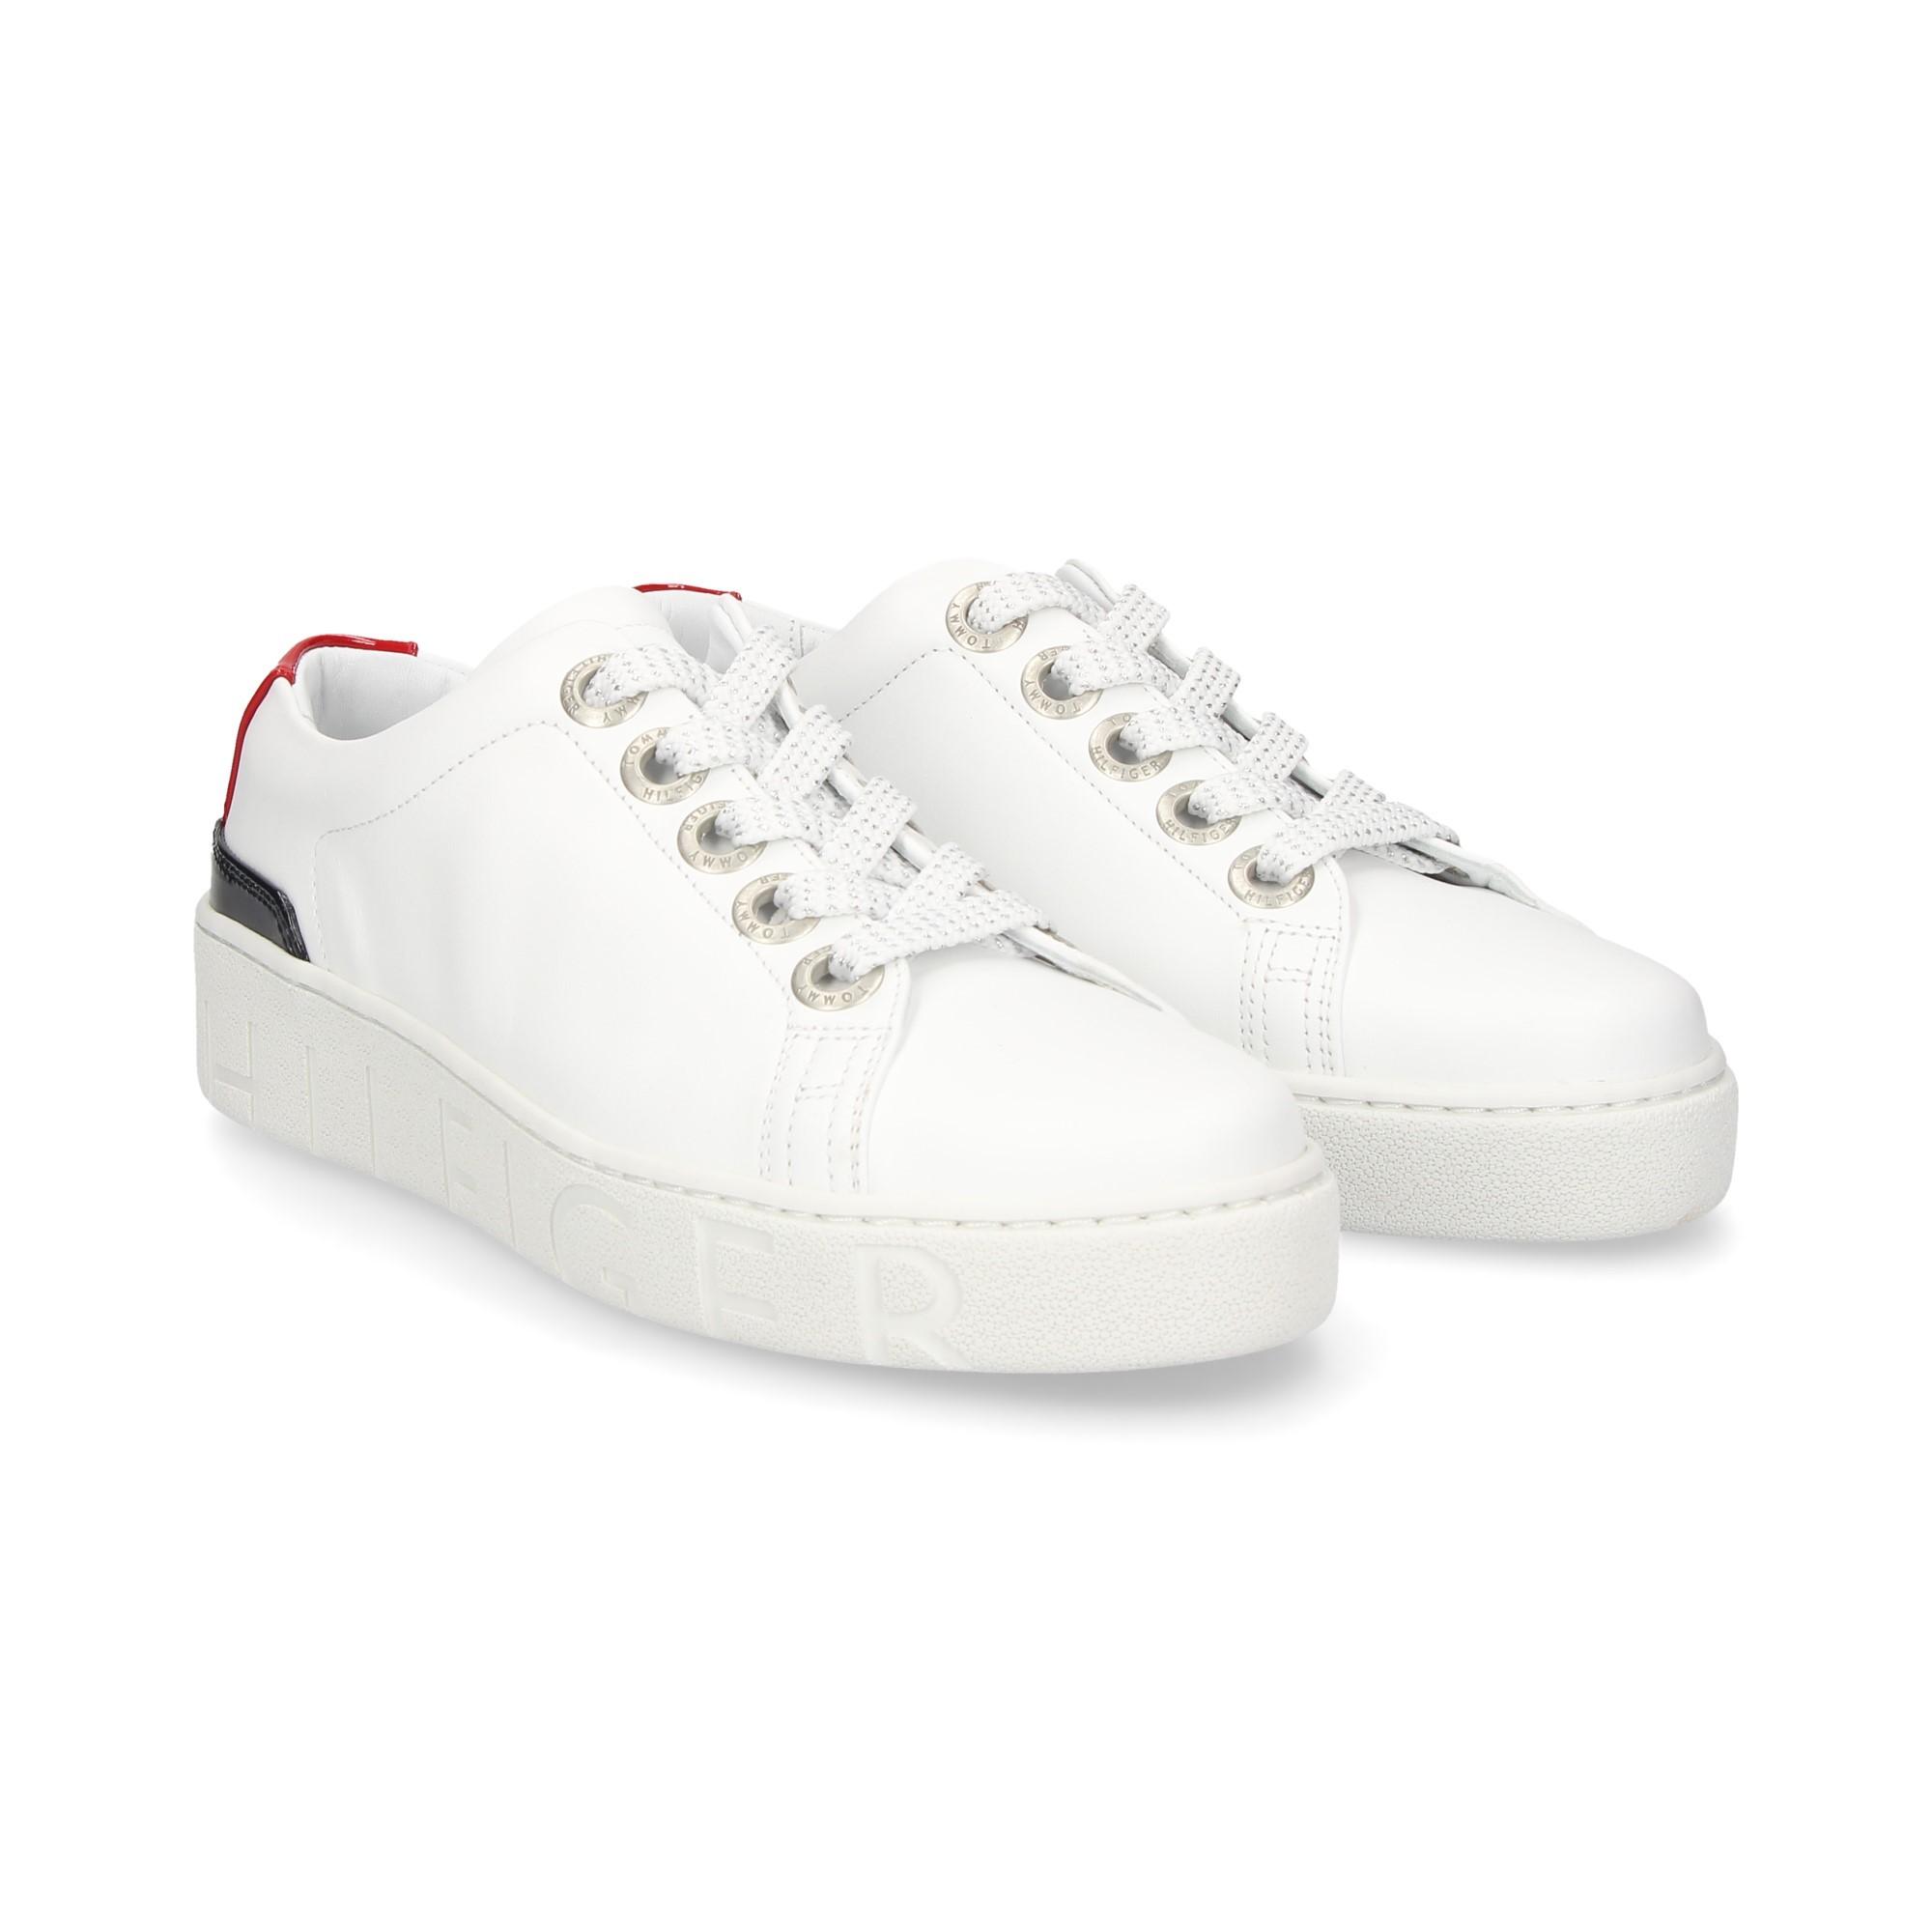 85bba0c923cec TOMMY HILFIGER Women's Sneakers FW03343 020 RWB